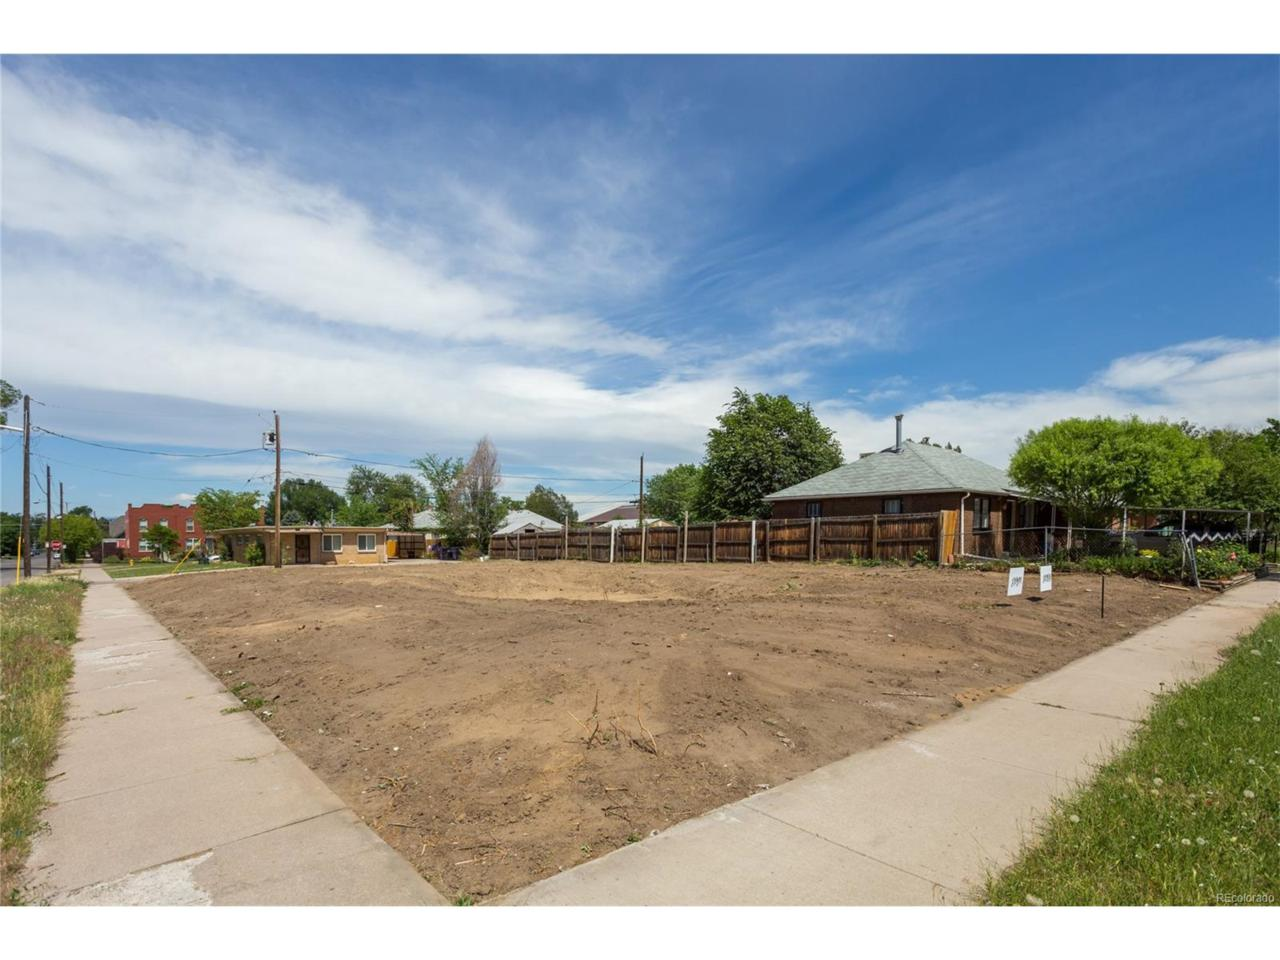 3701 N Gaylord Street, Denver, CO 80205 (MLS #2952833) :: 8z Real Estate